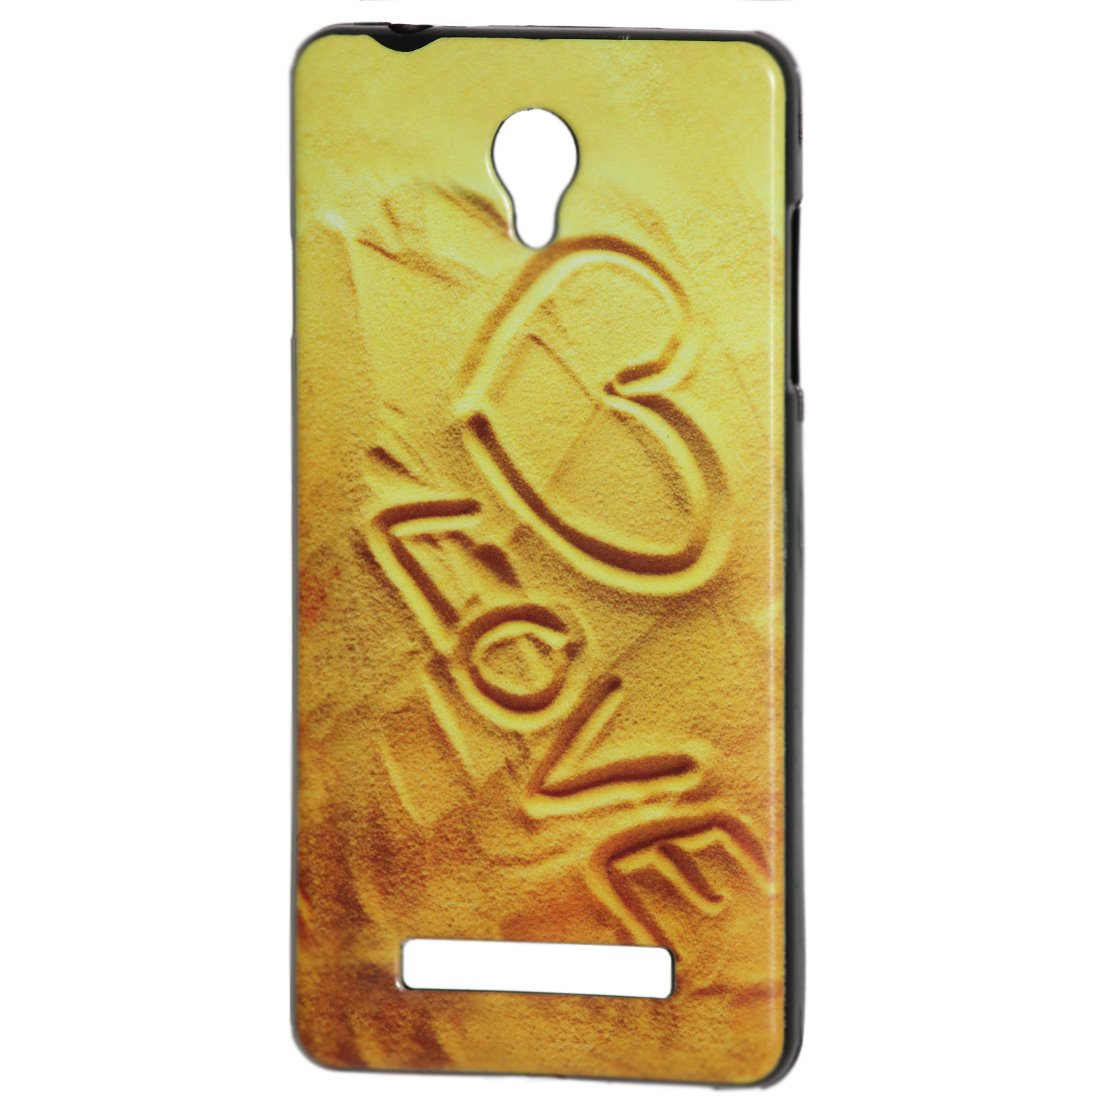 new styles 5eb4c 4830b Zaoma Designer Back Cover for Micromax Canvas Pulse 4G: Amazon.in ...